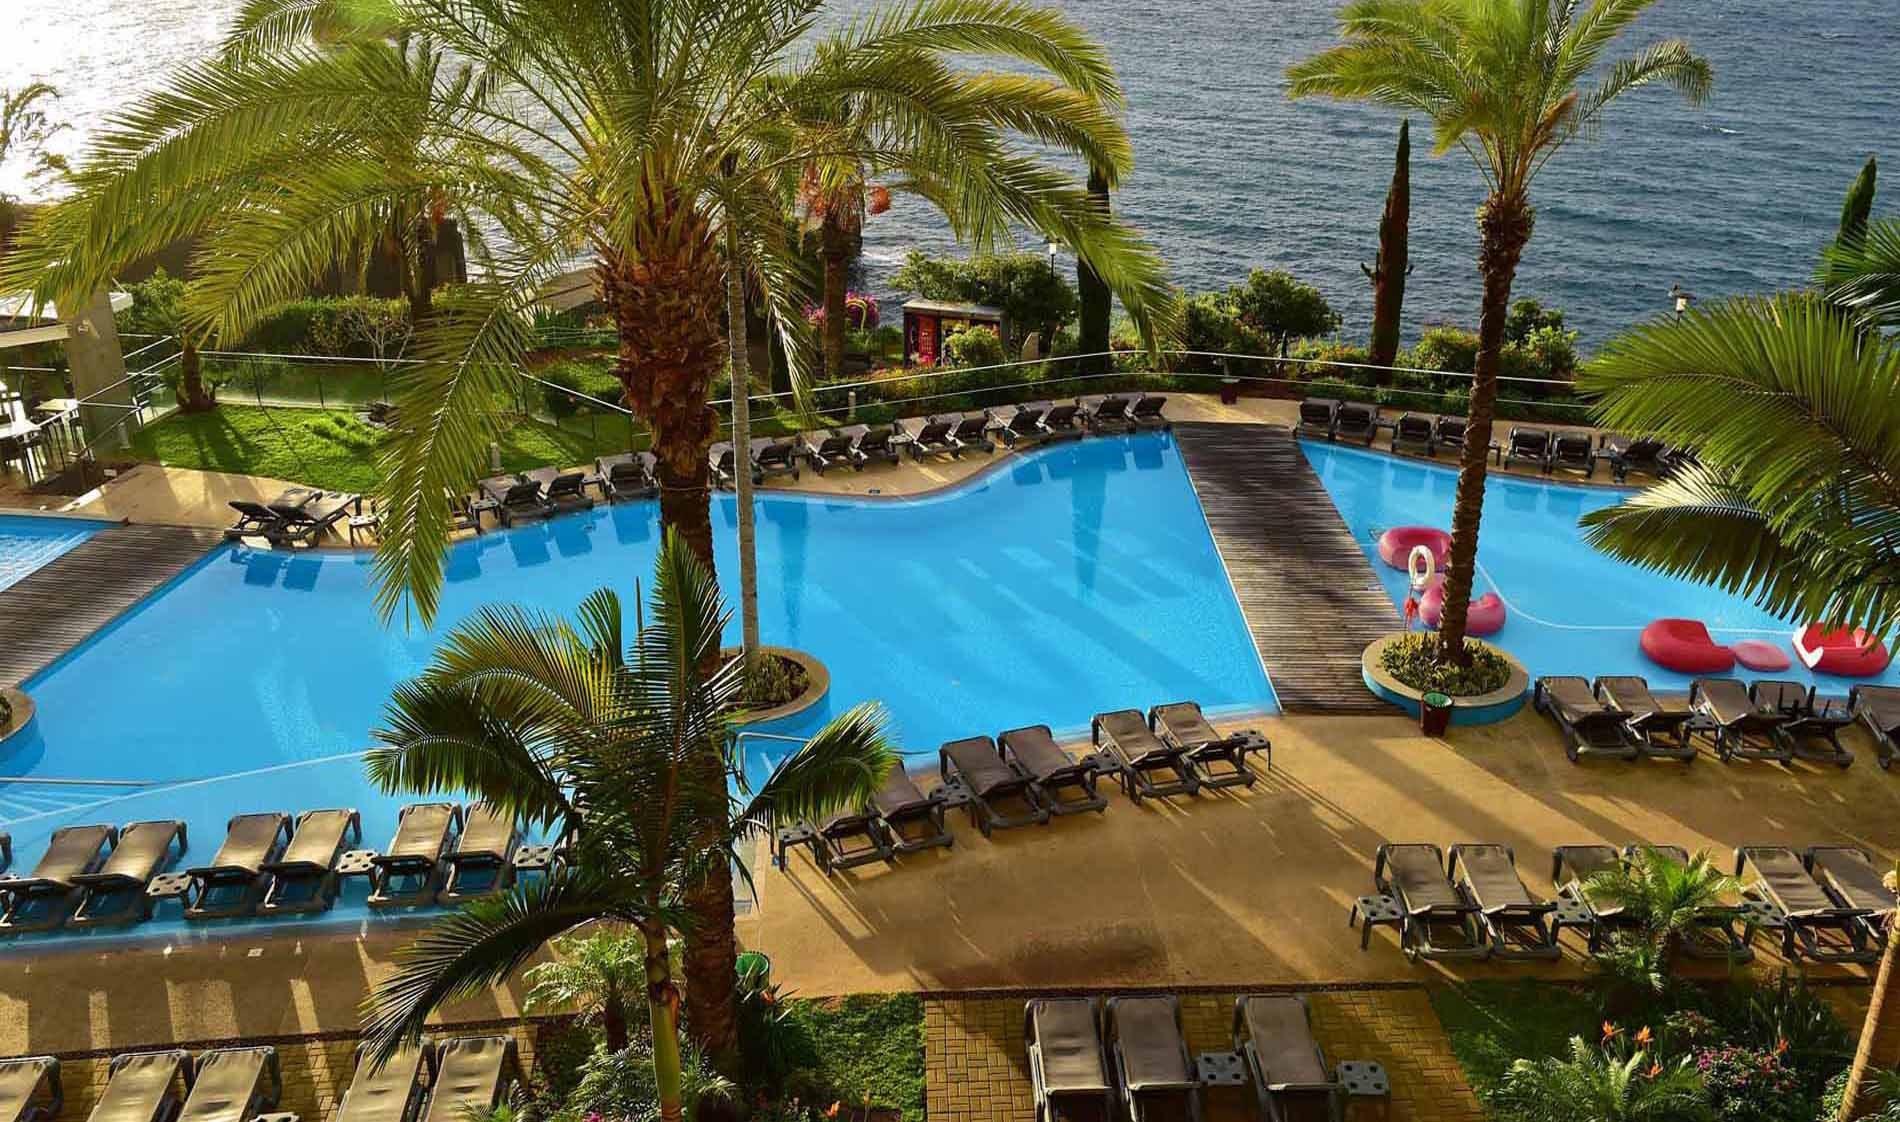 Pestana casino hotel